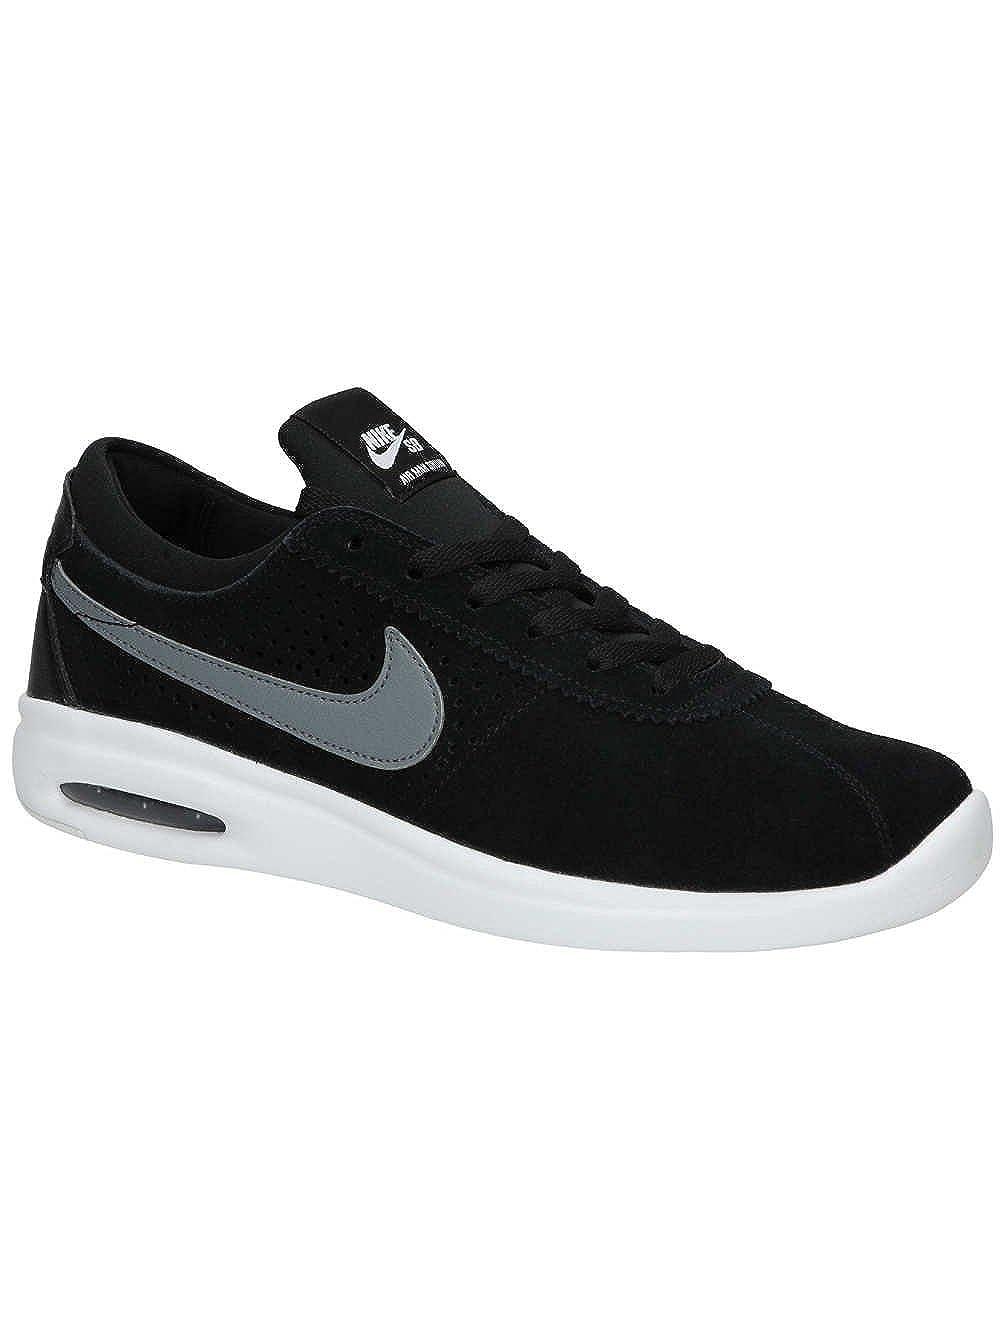 Nike SB Air Air Air Max Bruin Vapor - Scarpe da Skateboard Uomo B06XTFS2KL 36 EU Nero (nero Cool grigio bianca bianca 001) | Outlet Store Online  | Fornitura sufficiente  | La Vendita Calda  | Acquisti online  | qualità regina  | Qualità  0f9ca5